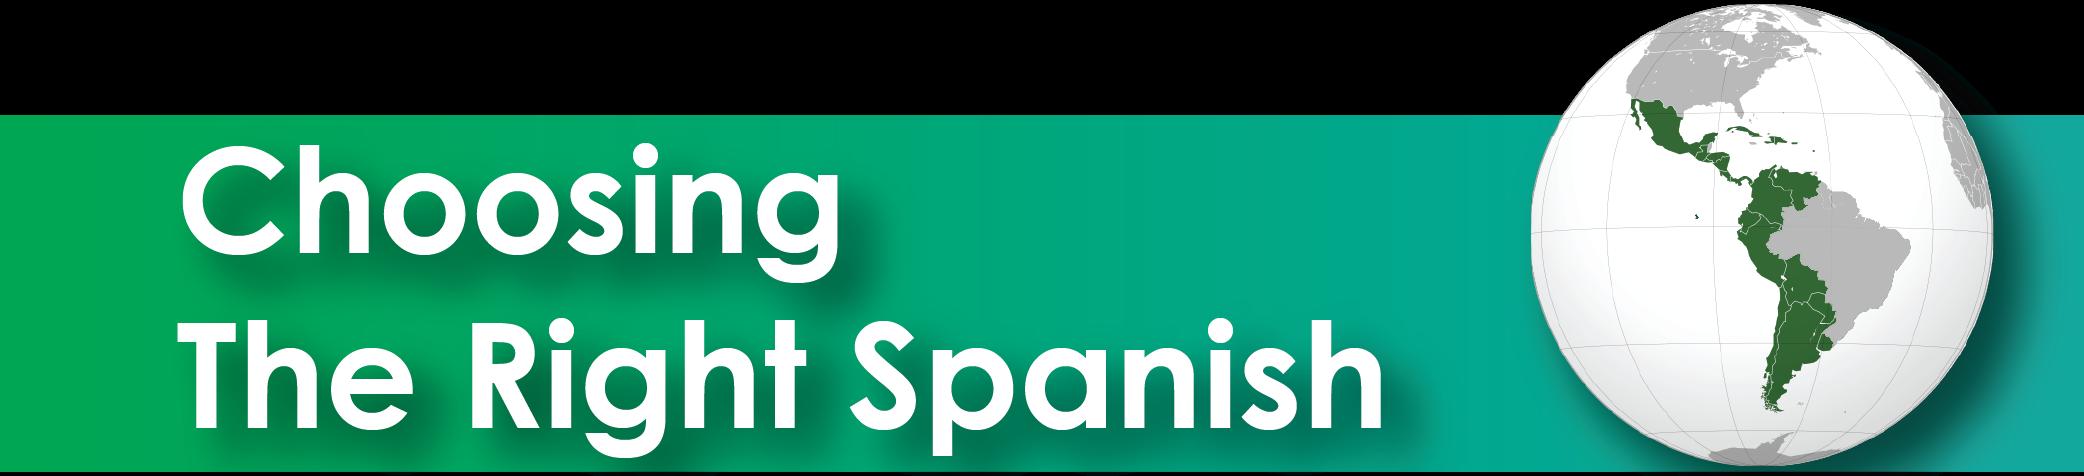 spanish in usa